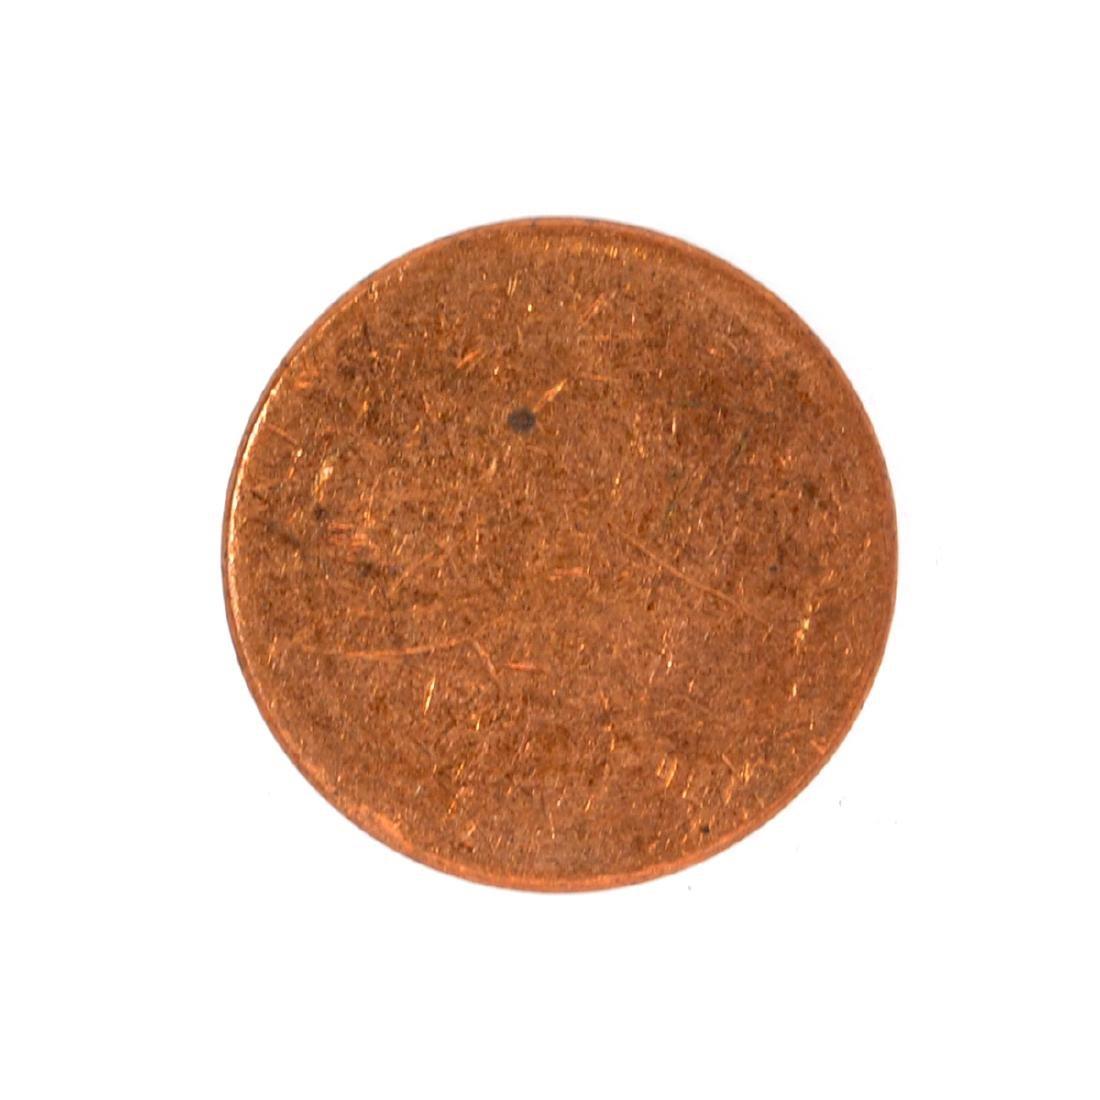 Mint U.S. 1 Cent Blank Planchet Coin